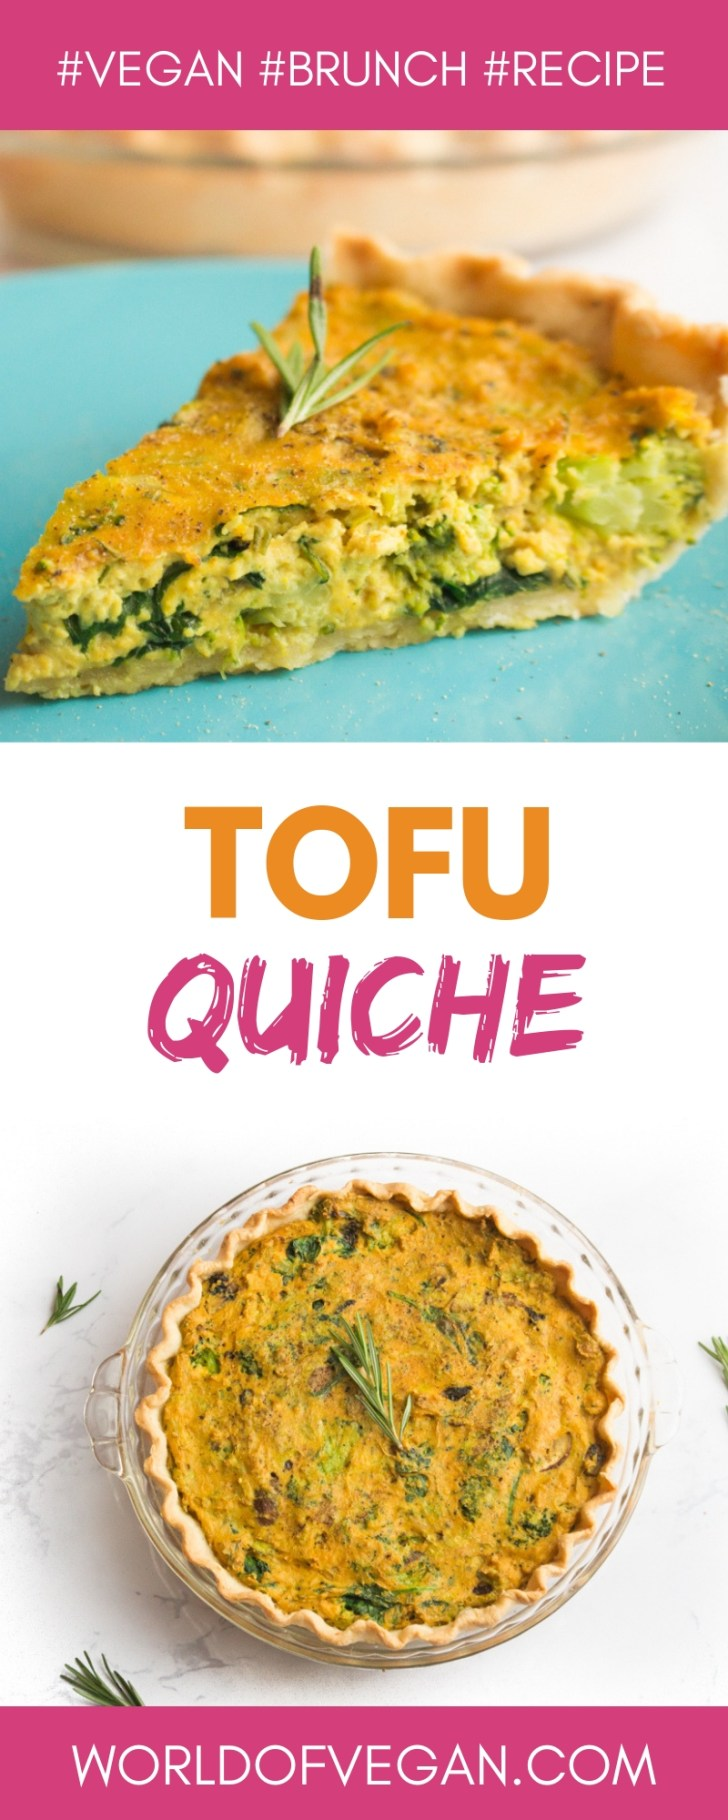 Tofu Quiche   Delicious Plant-Based Brunch Recipe   WorldOfVegan.com   #vegan #brunch #tofu #recipe #breakfast #quiche